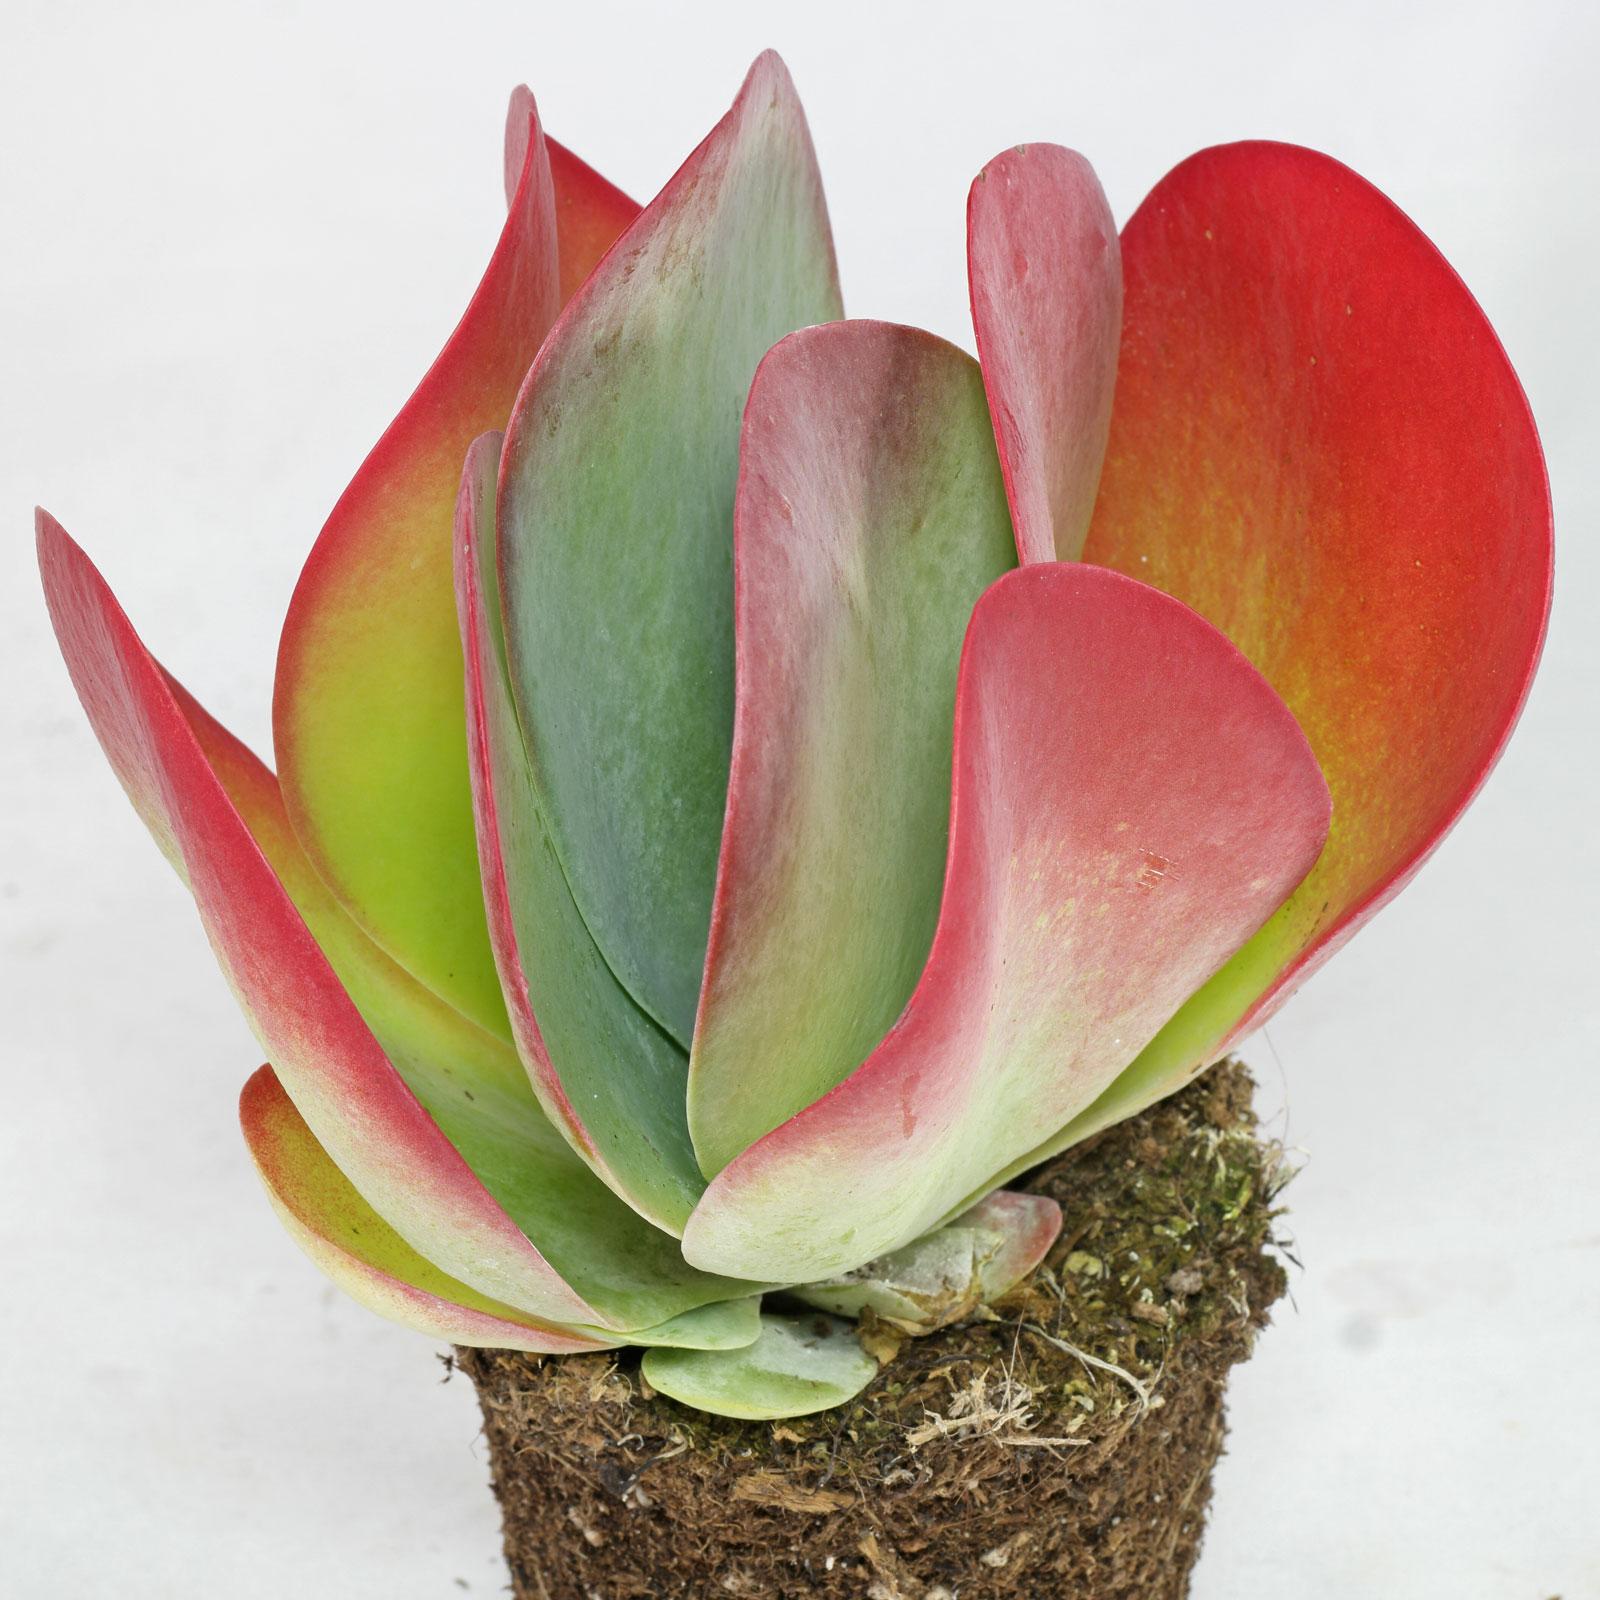 Kalanchoe thyrsiflora